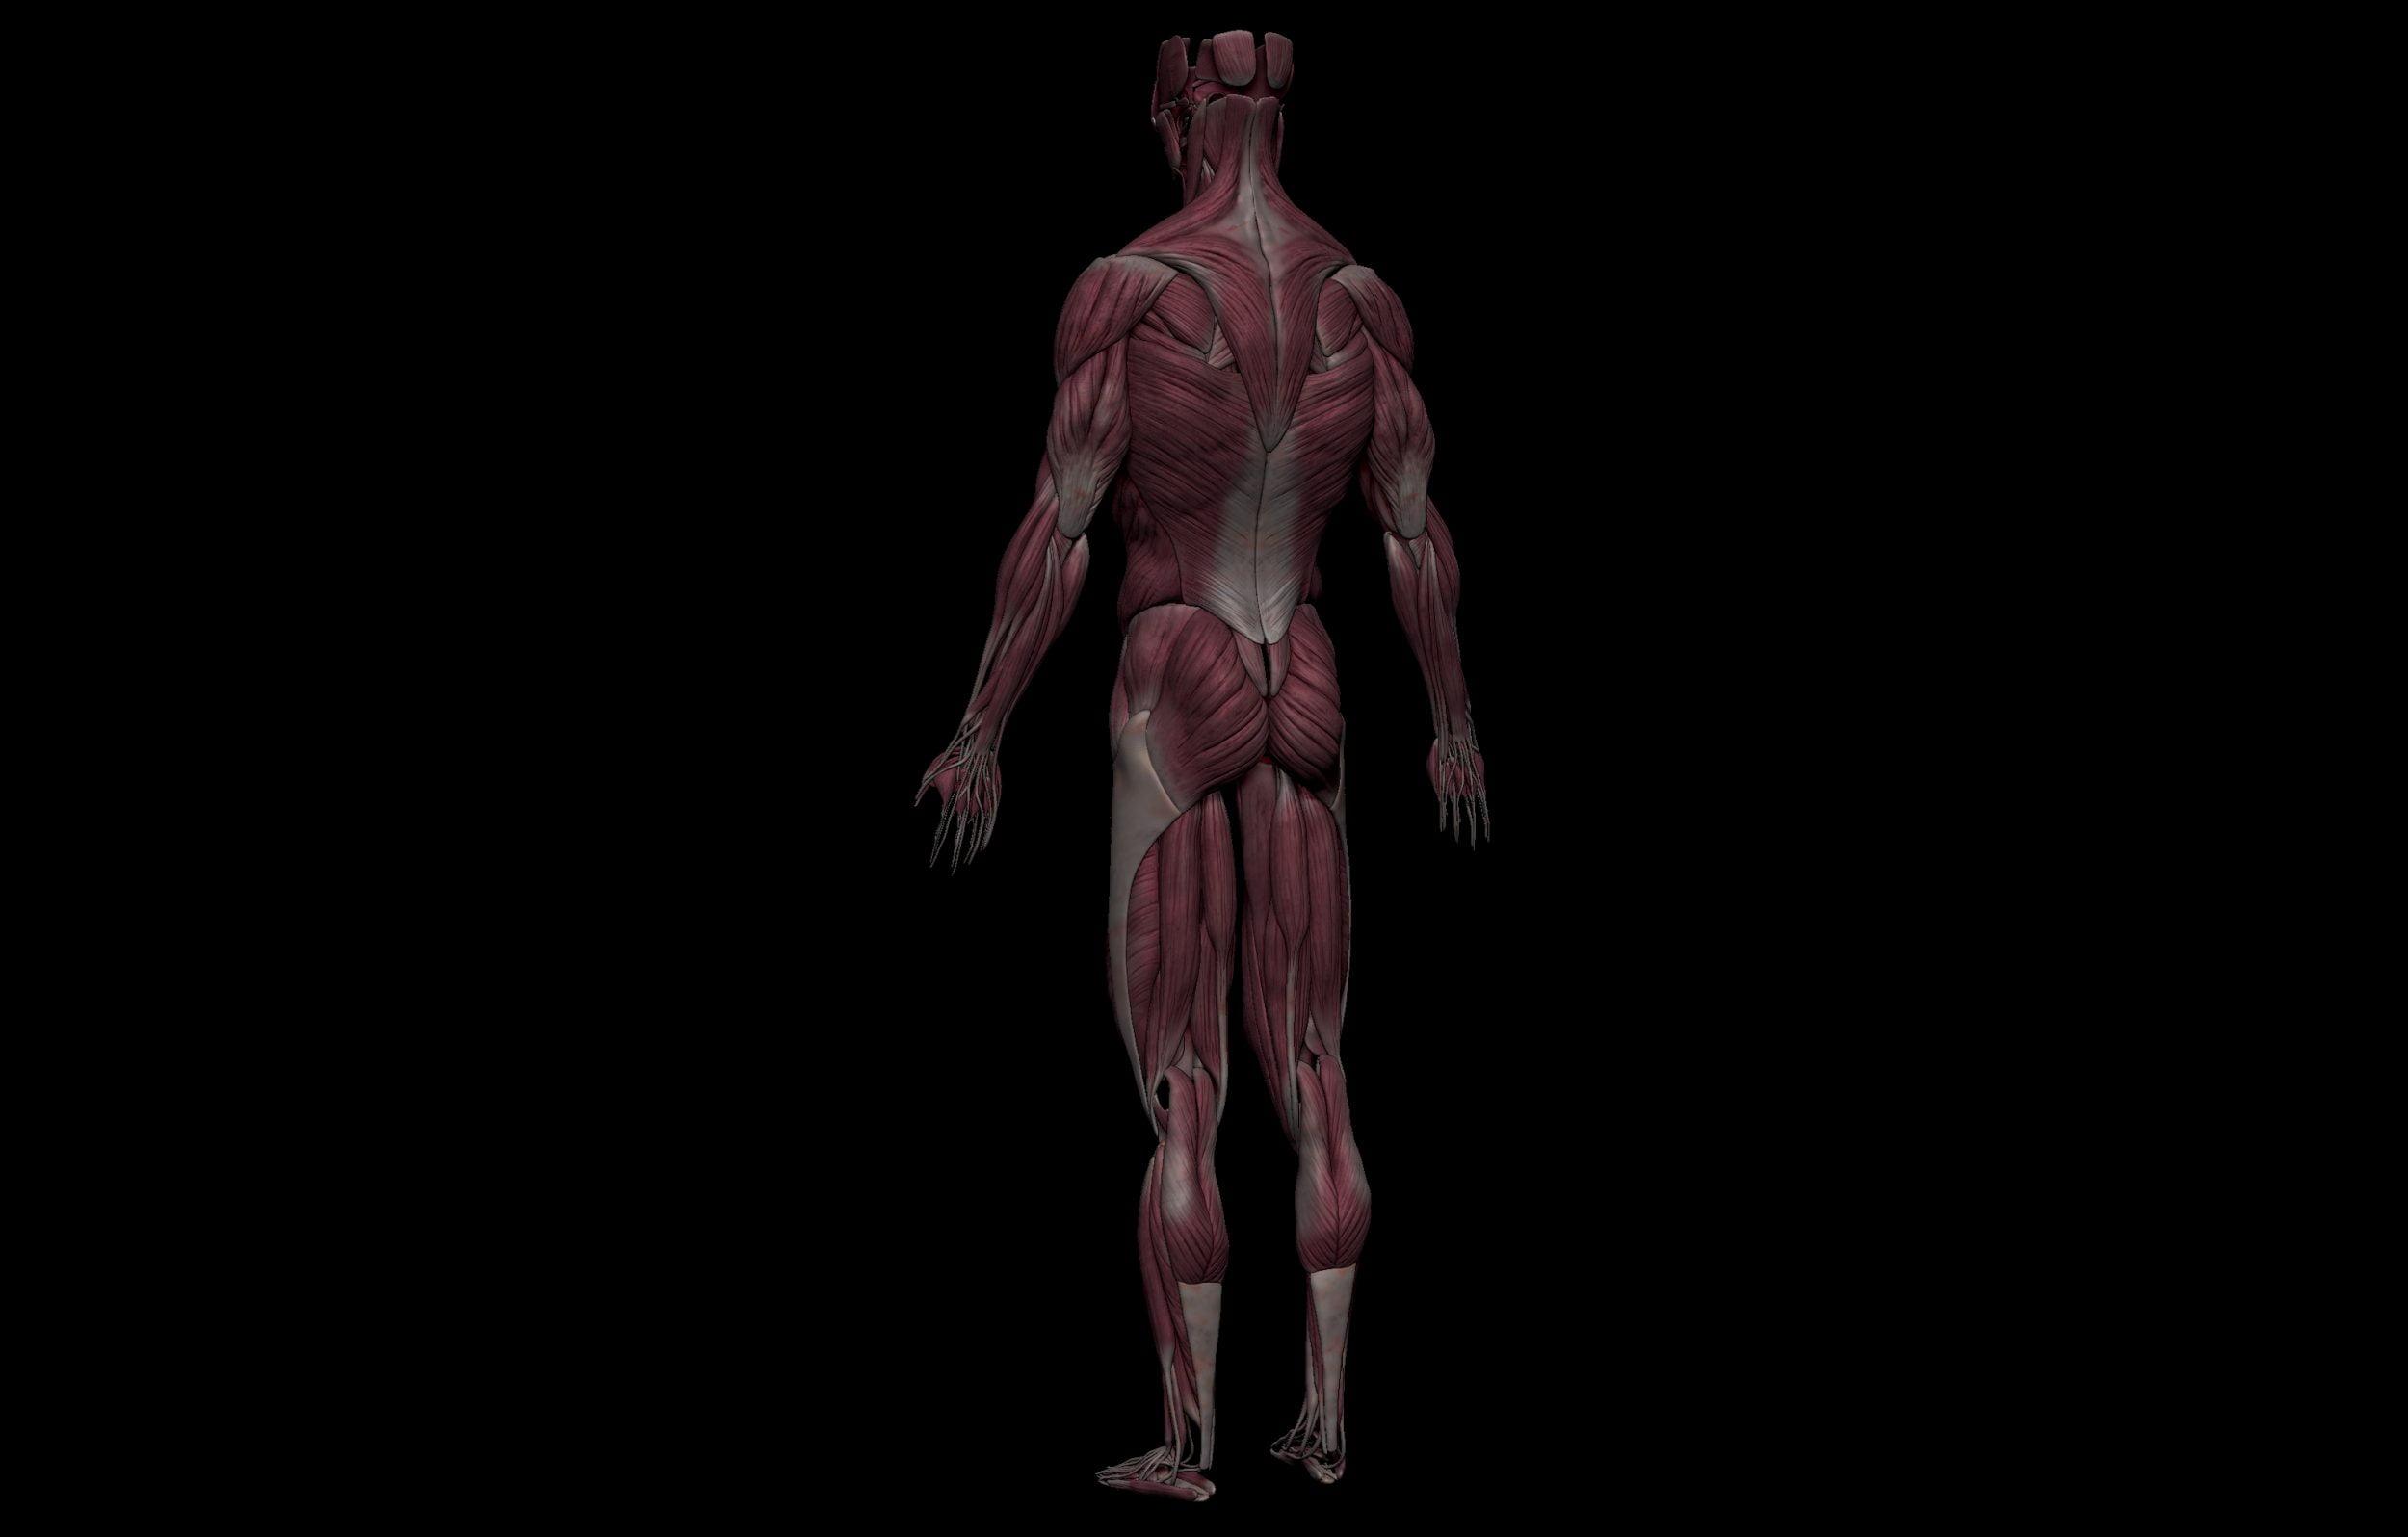 4 3 scaled SA Anatomy   Study Anatomy in 3D